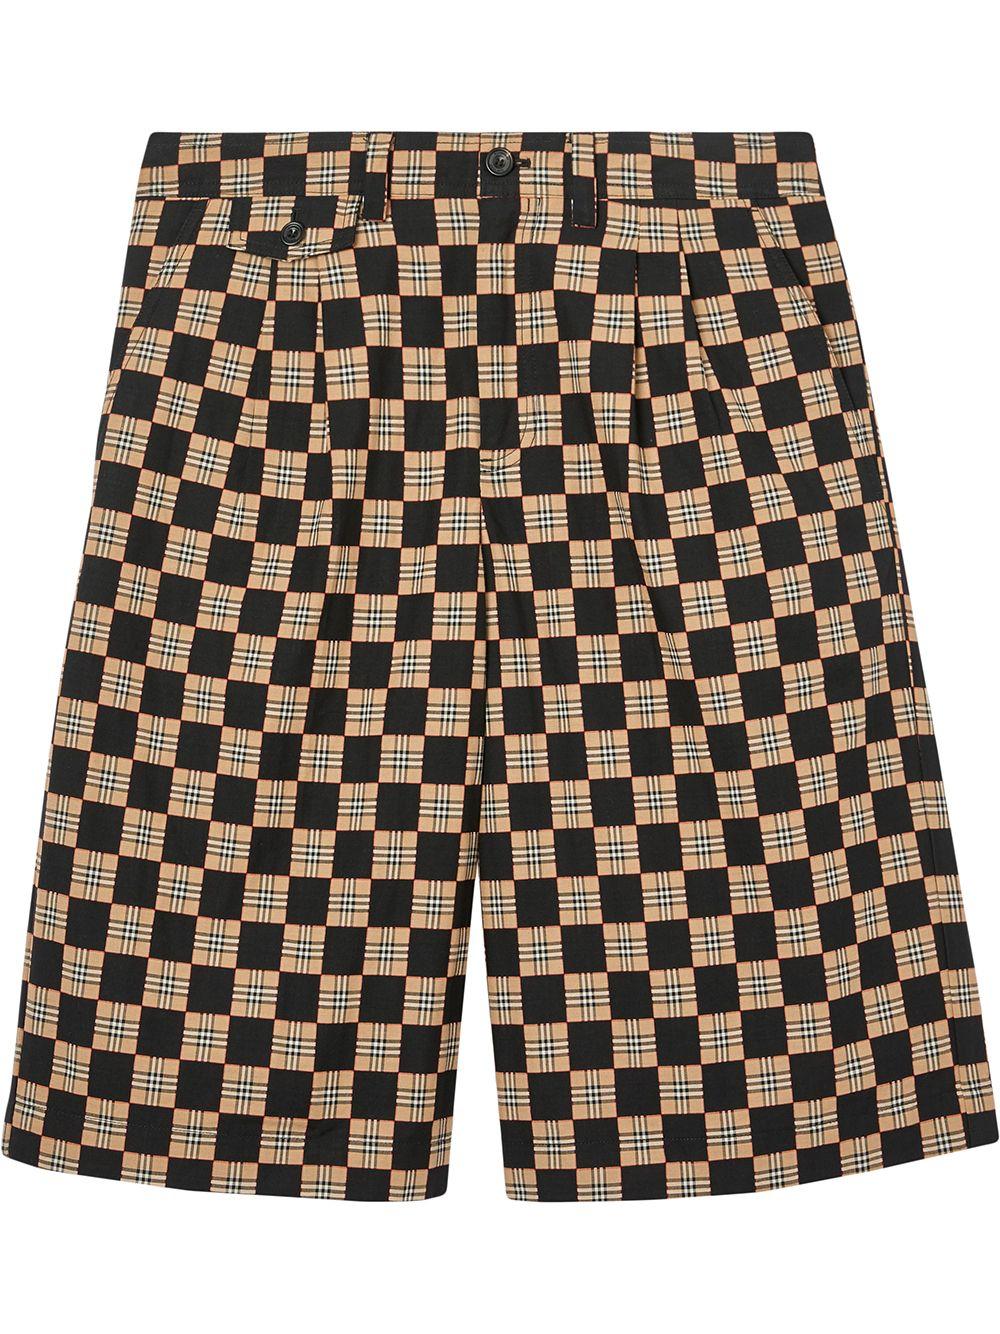 Burberry Shorts mit Schachbrettmuster - Braun